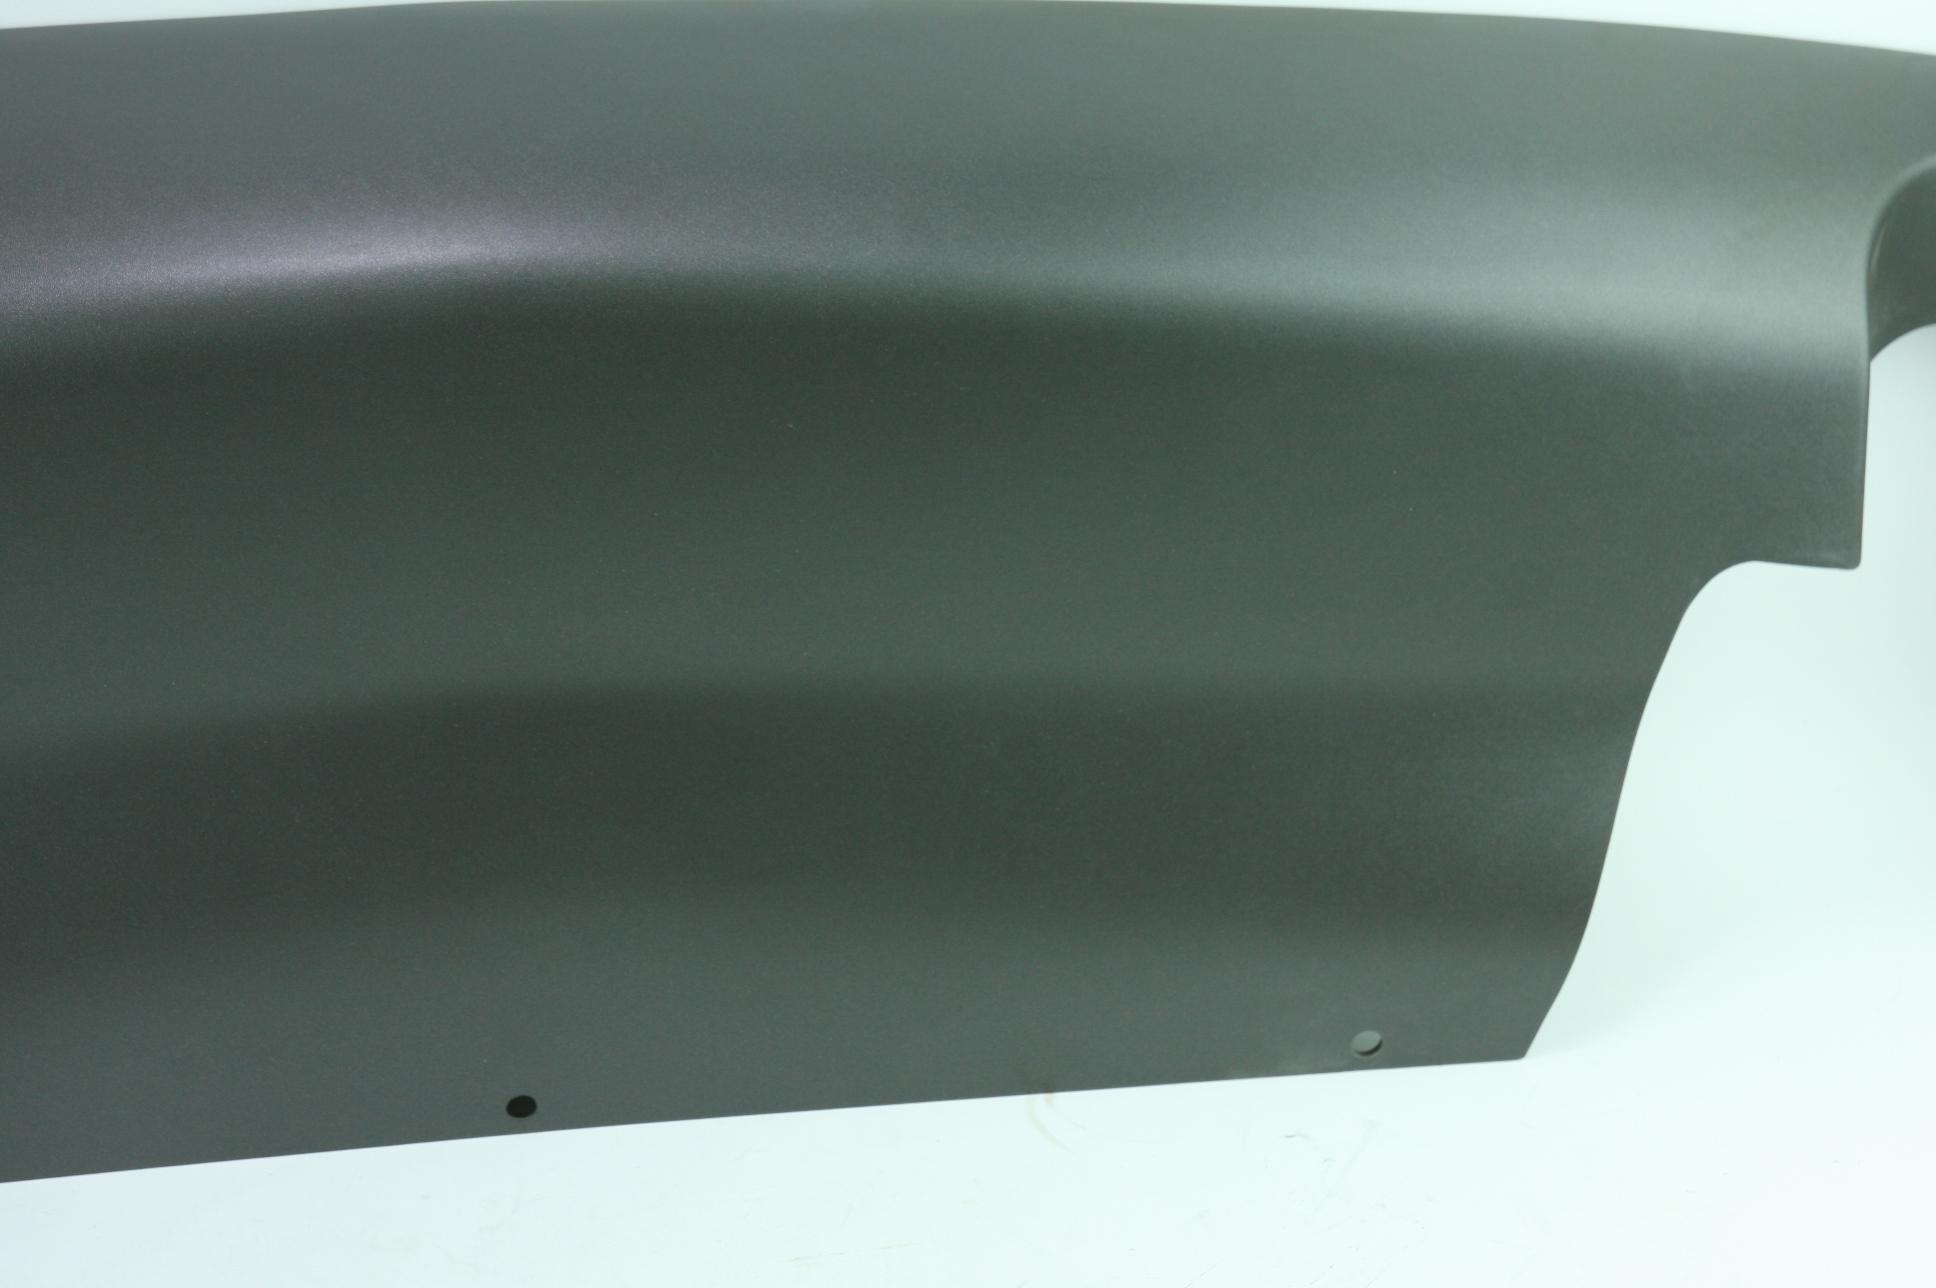 * New Genuine OEM GM 25747970 Cadillac 05-07 STS Rear Bumper Insert Panel NIP - image 5